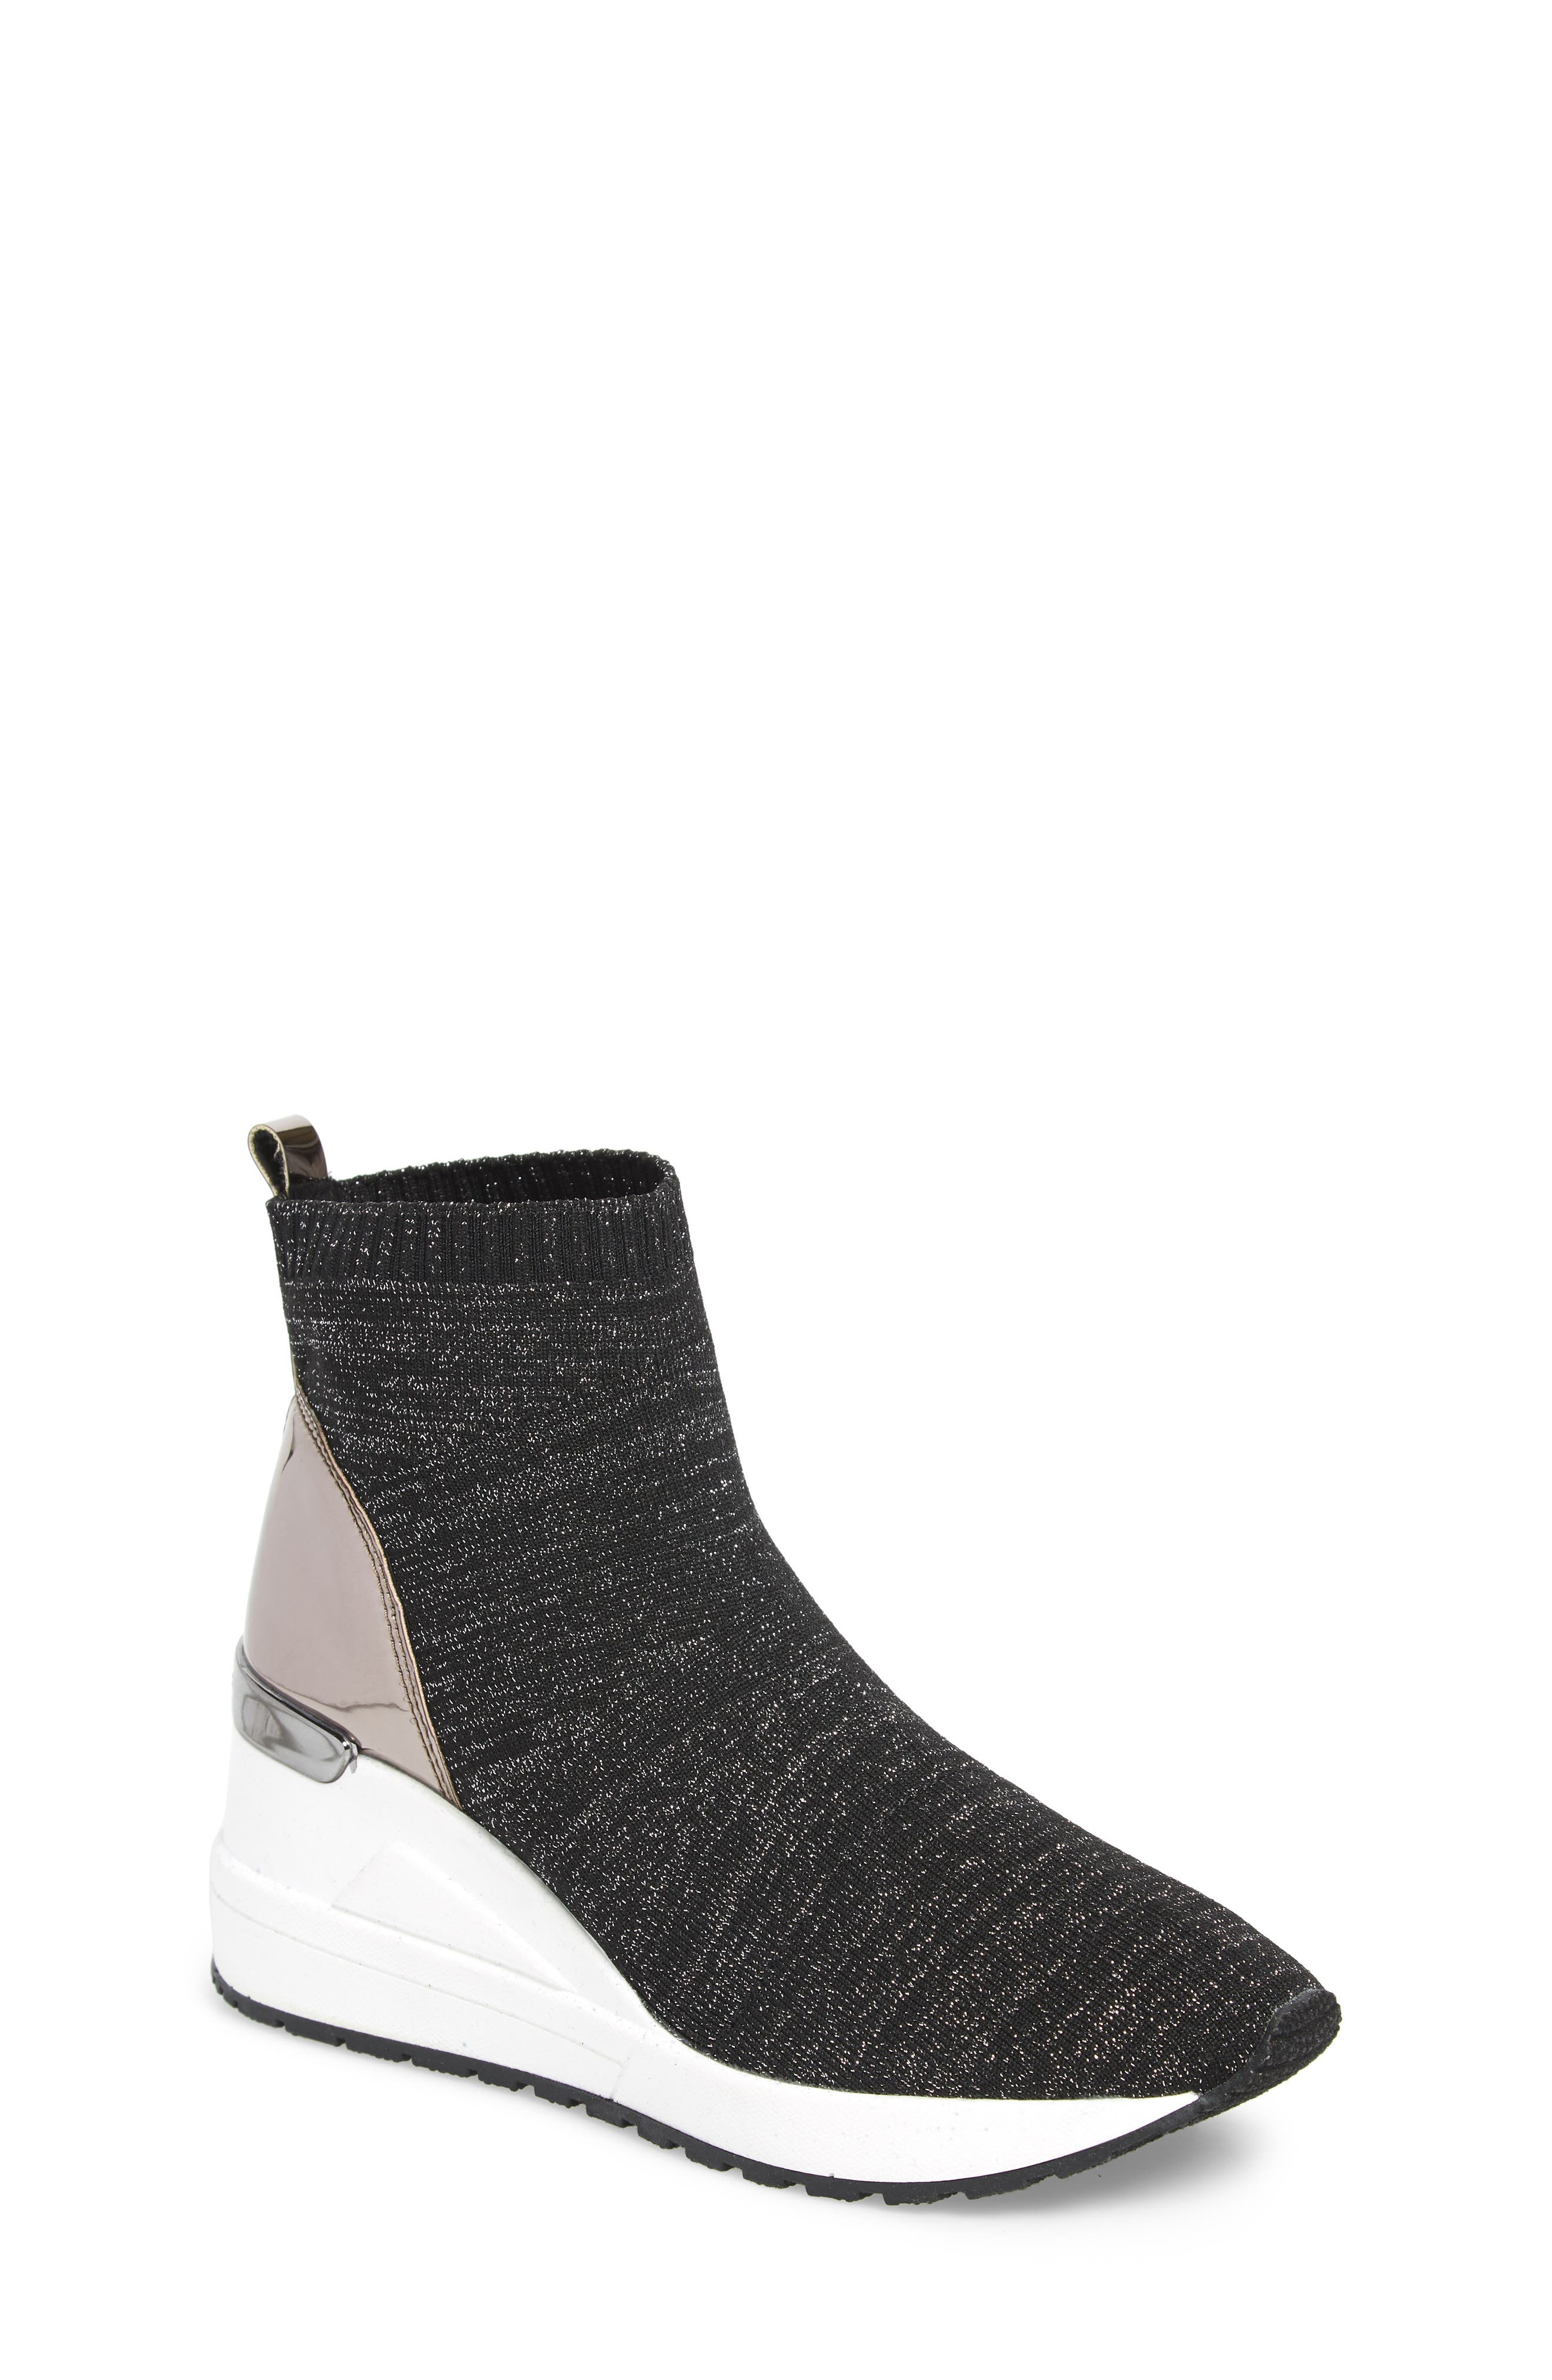 Neo Flex Metallic Wedge Sneaker,                             Main thumbnail 1, color,                             BLACK METALLIC